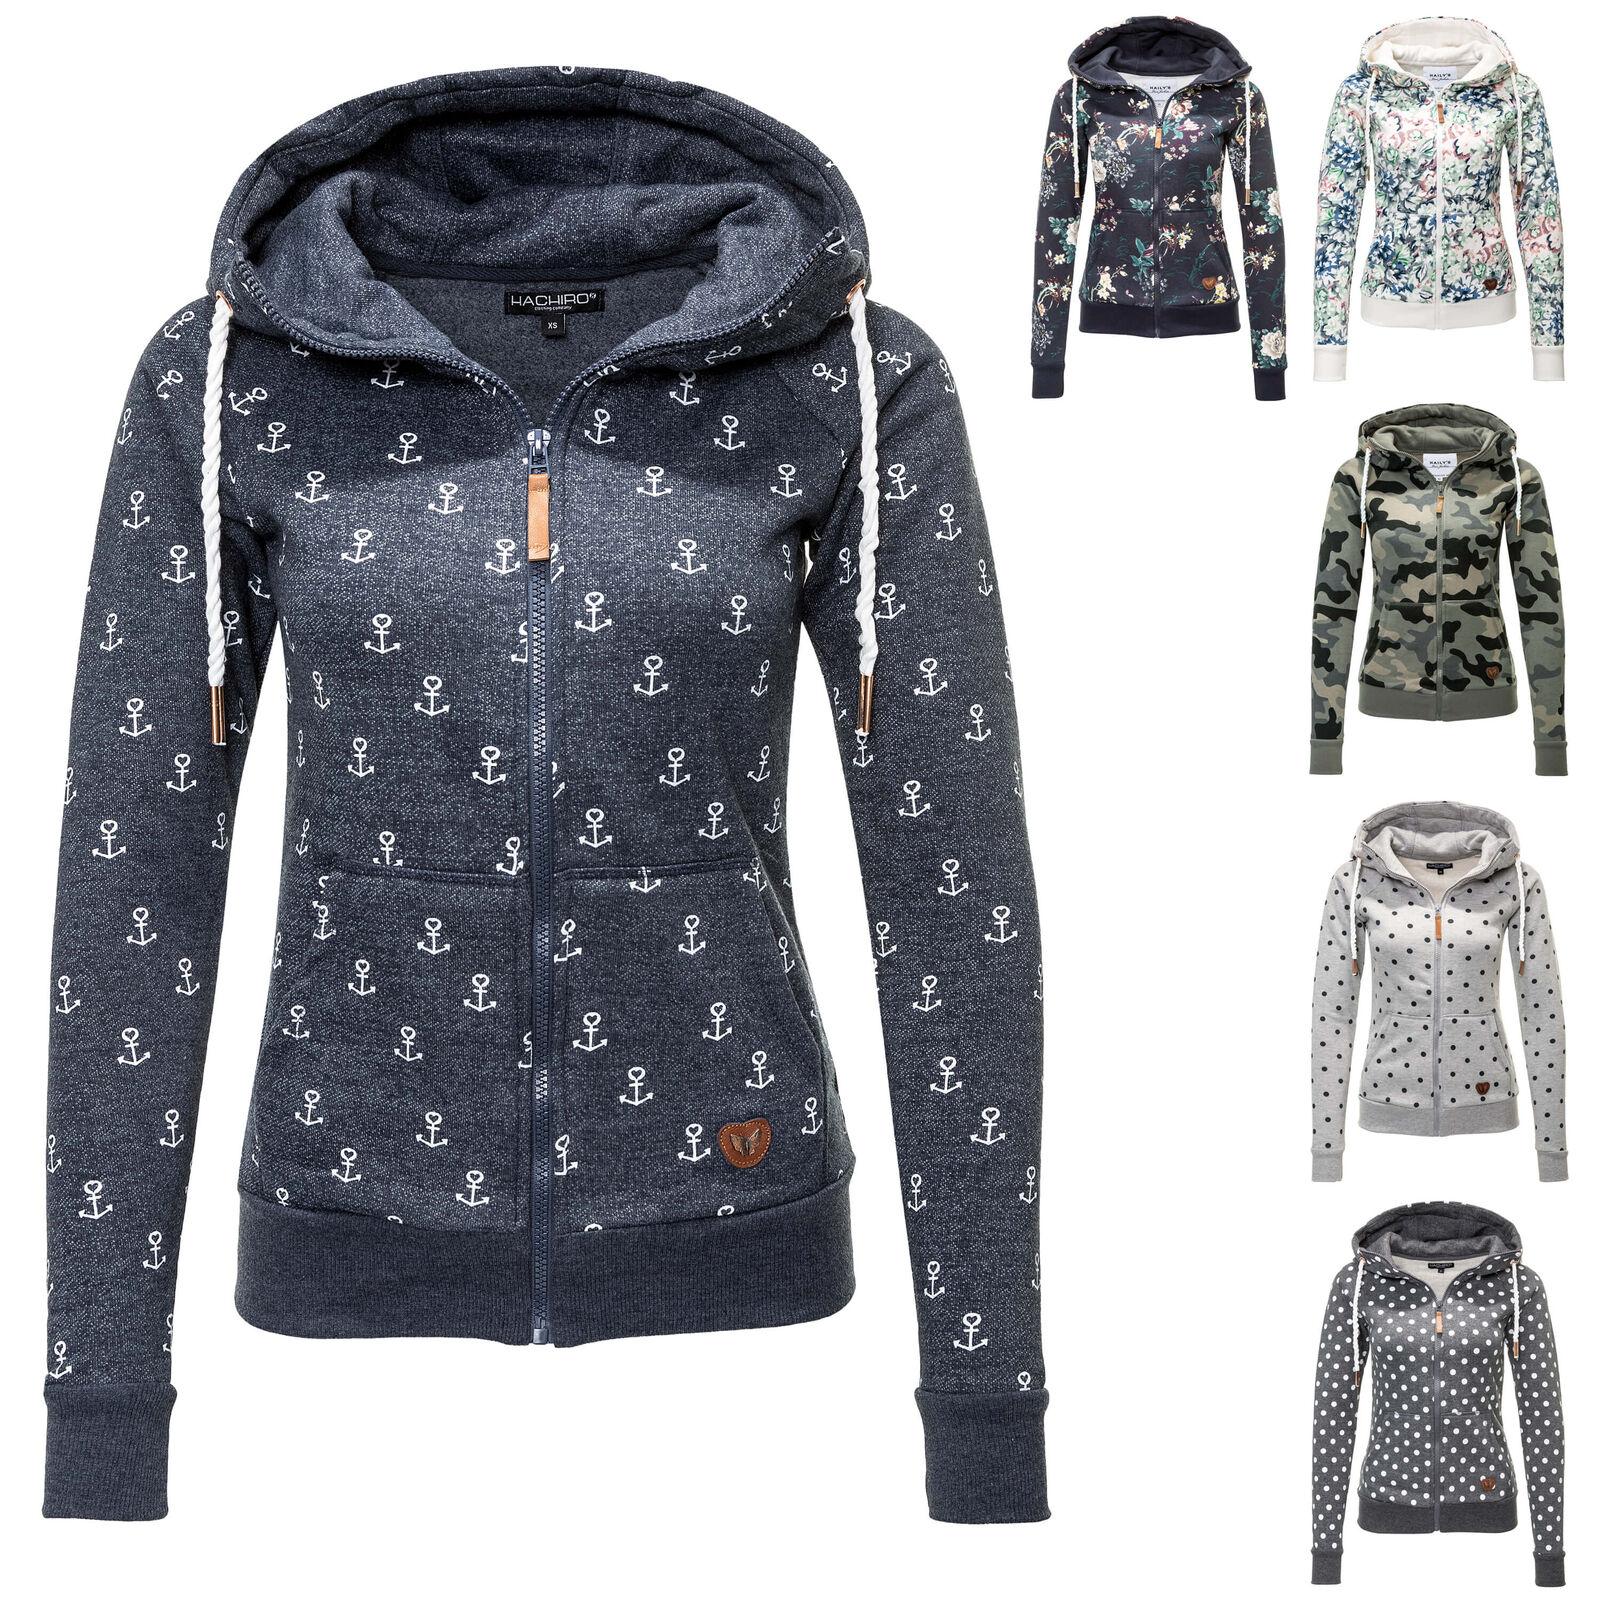 Hailys Damen Sweatjacke mit Kapuze Damenjacke Hoodie Übergangsjacke Sweater